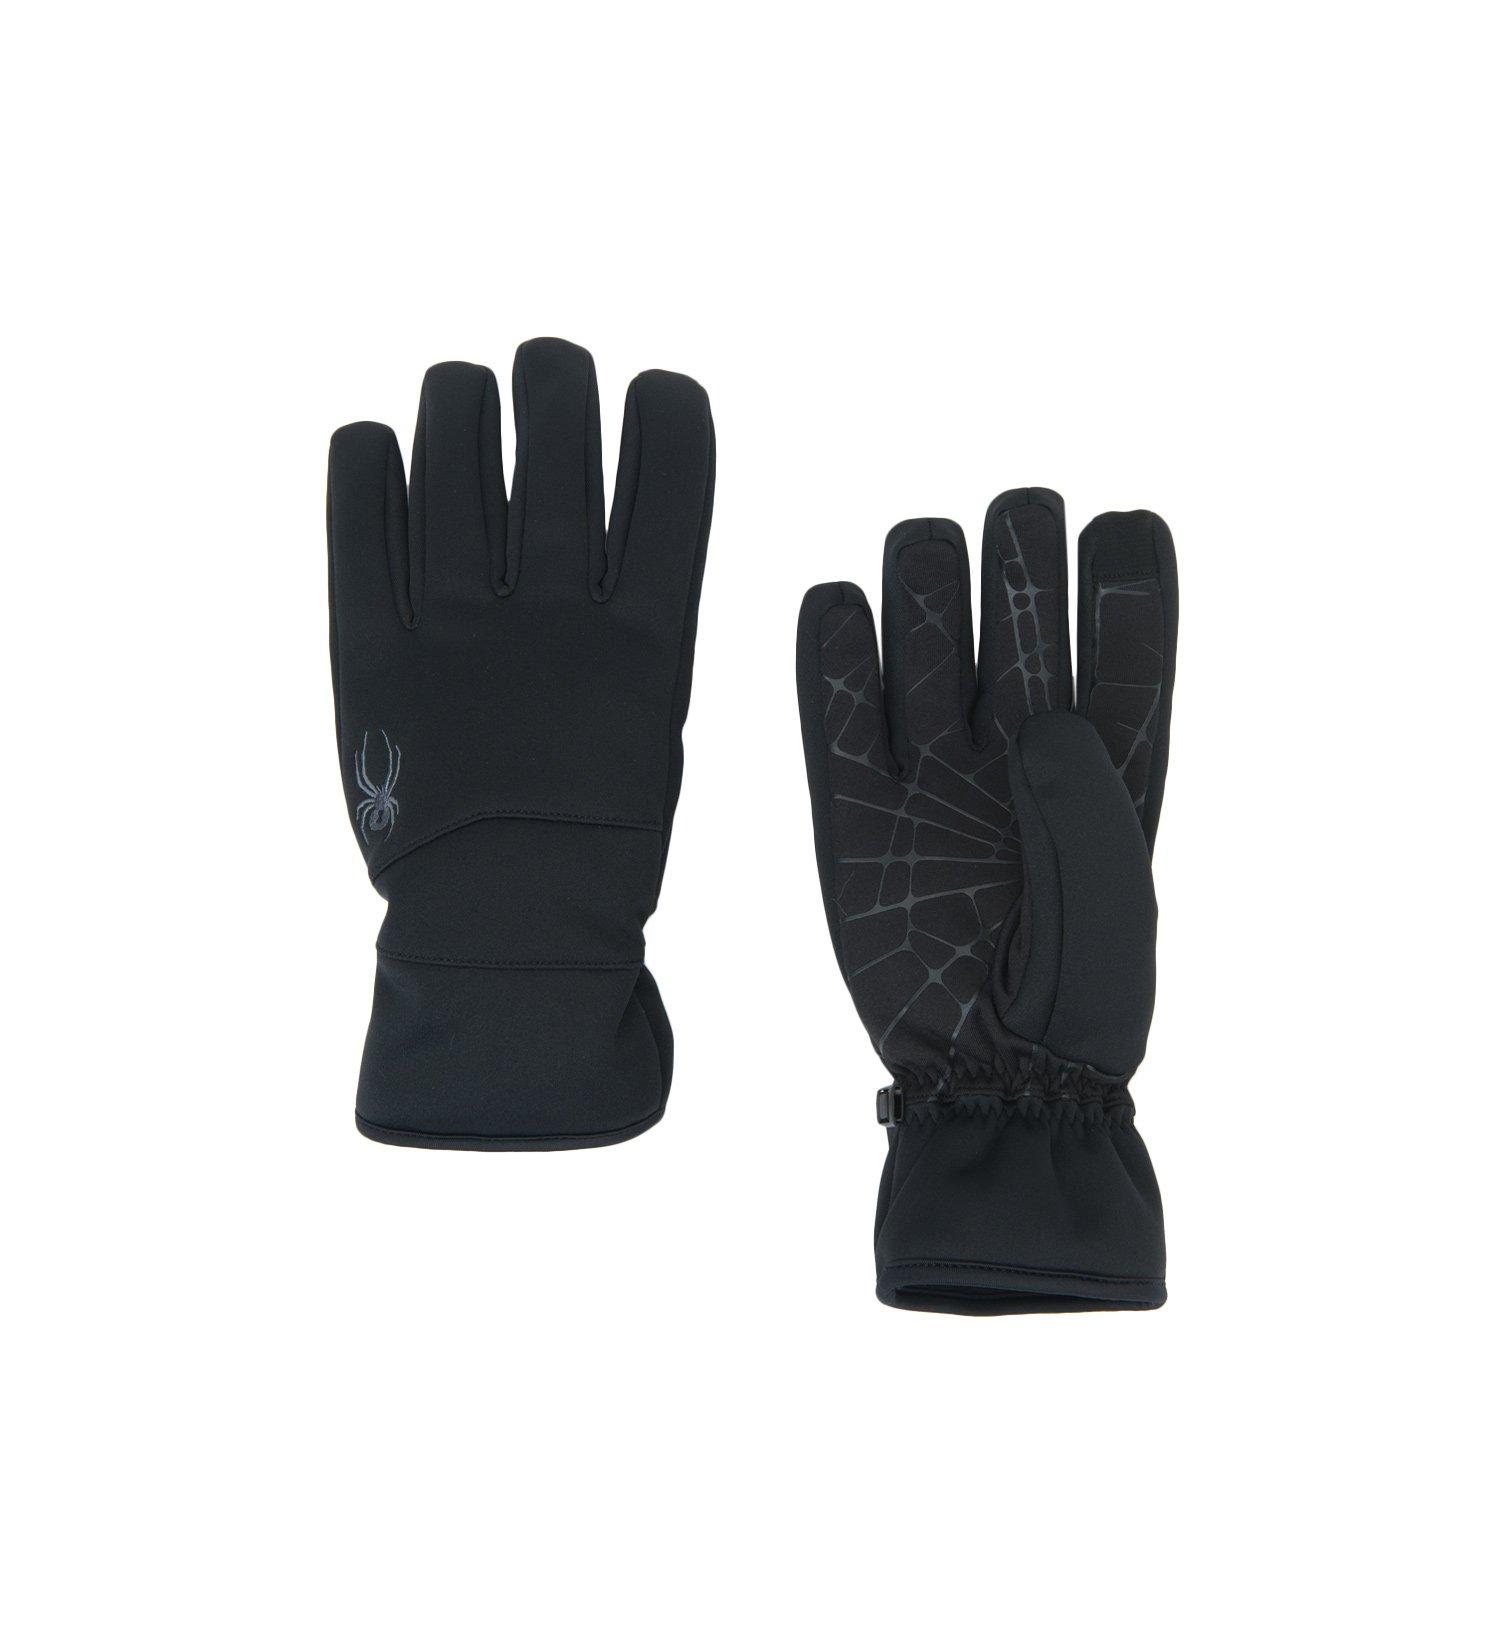 Spyder Facer Conduct Glove